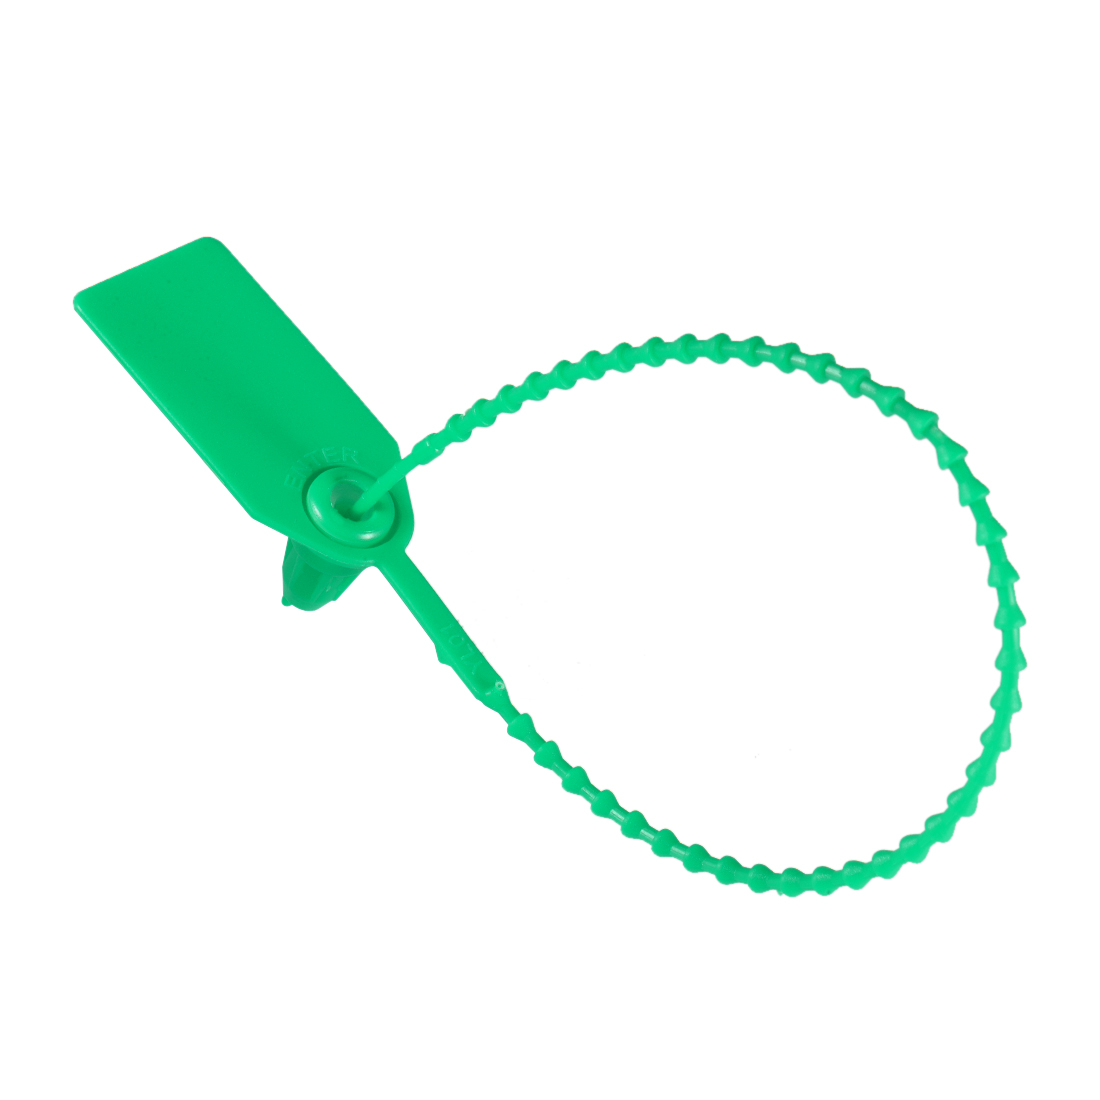 Plastic Zip Ties Seals Anti-Tamper 246mm Length, Green, Pack of 20